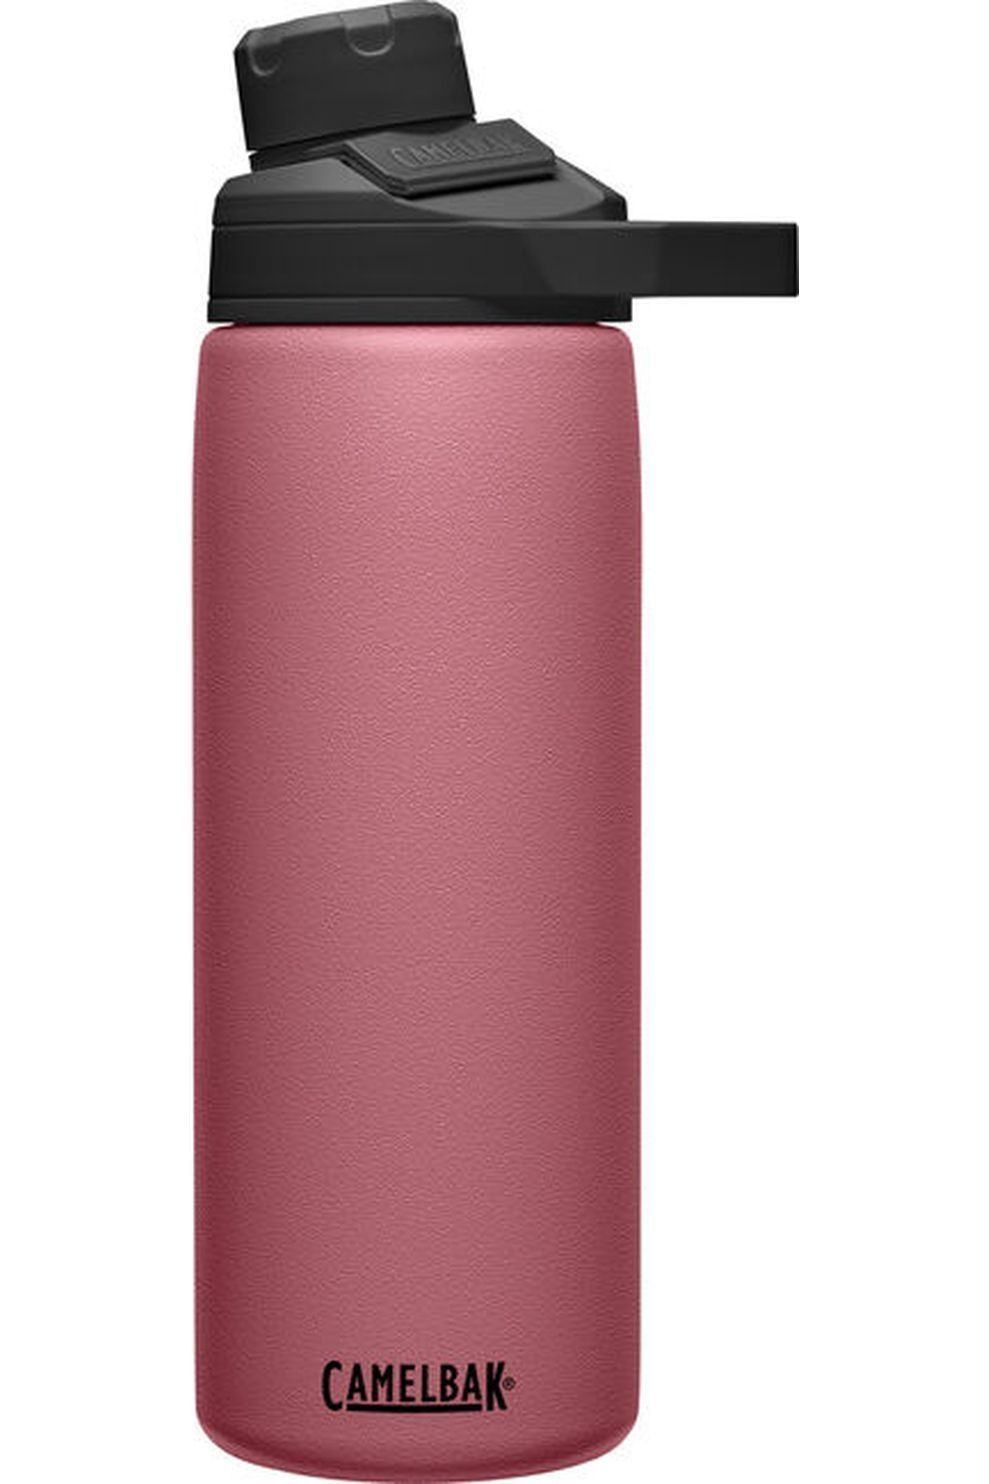 CamelBak Drinkfles Chute Mag Sst Insulated 20Oz/0,6L - Roze